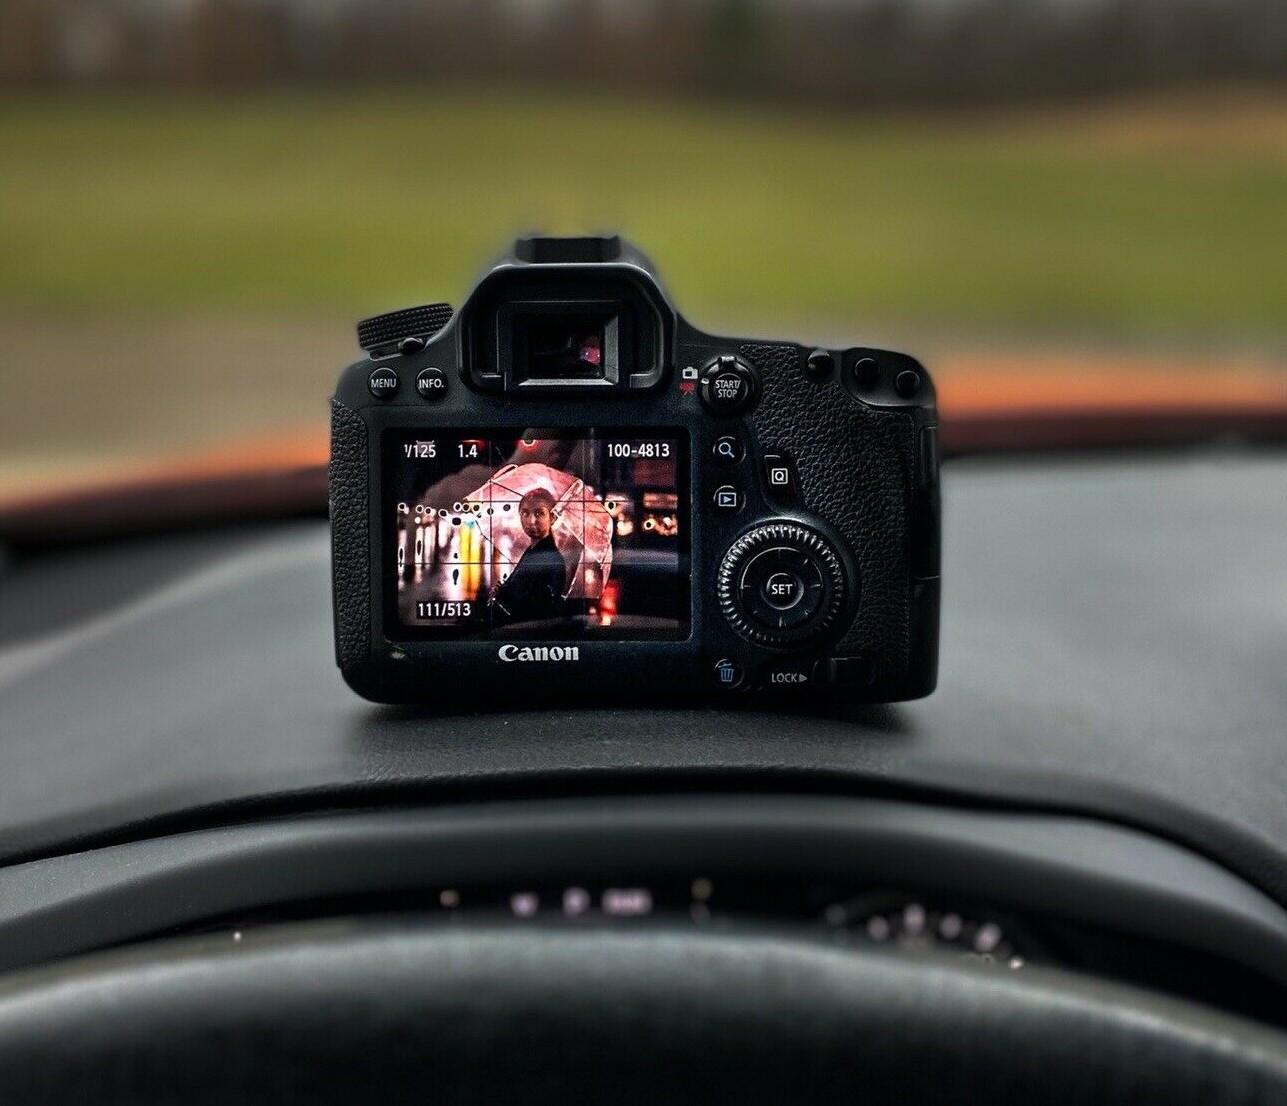 Canon EOS 6D 20.2MP Digital SLR Camera - Black (Body Only)..